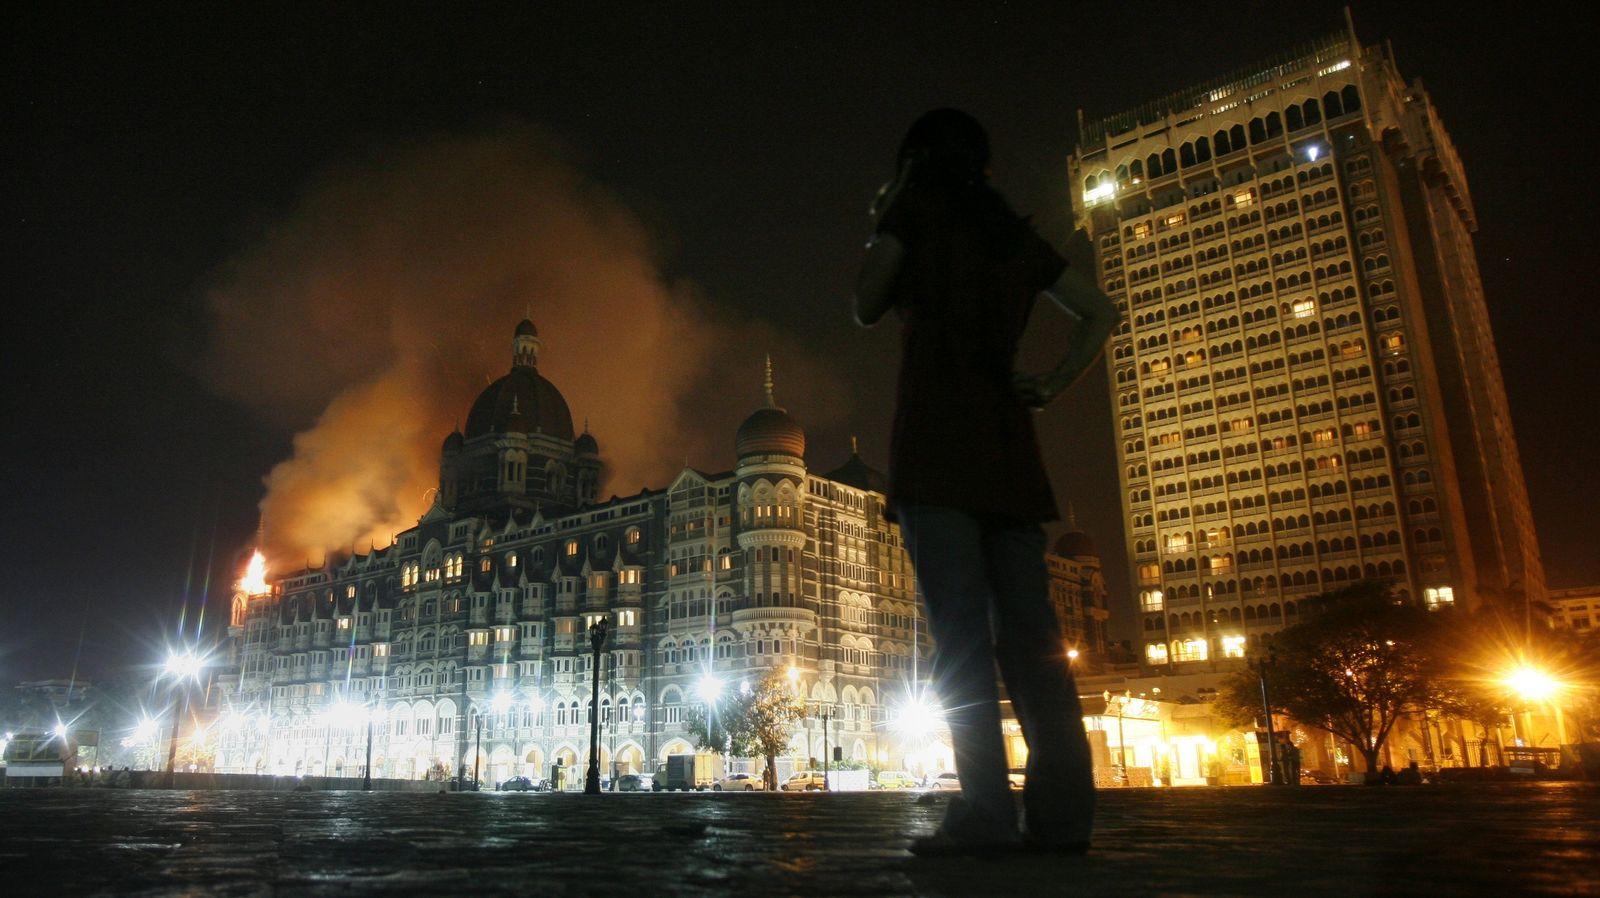 Yassin / Jahrzehnt / Mumbai / Terror-Attacke